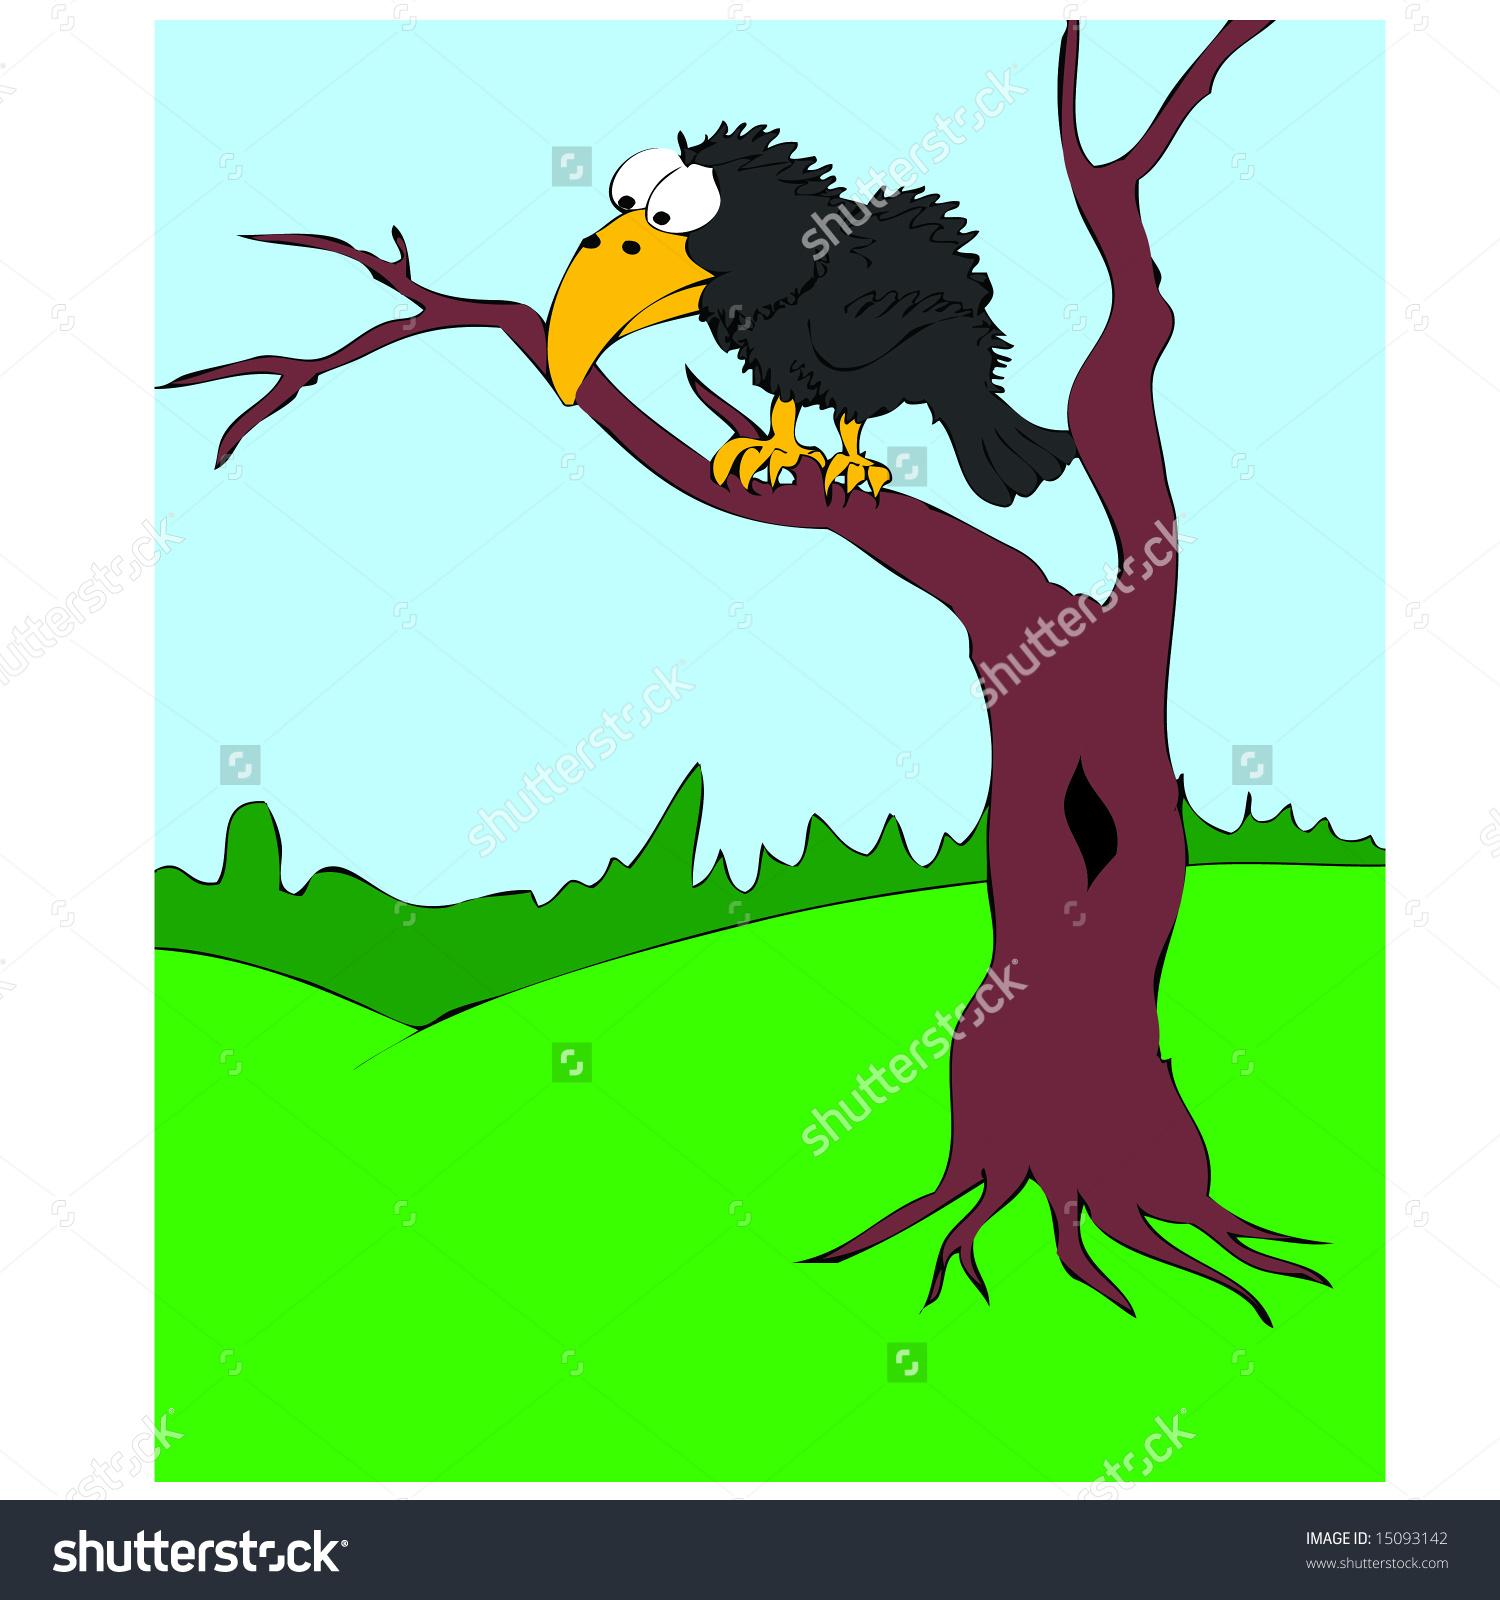 Crow clipart disney.